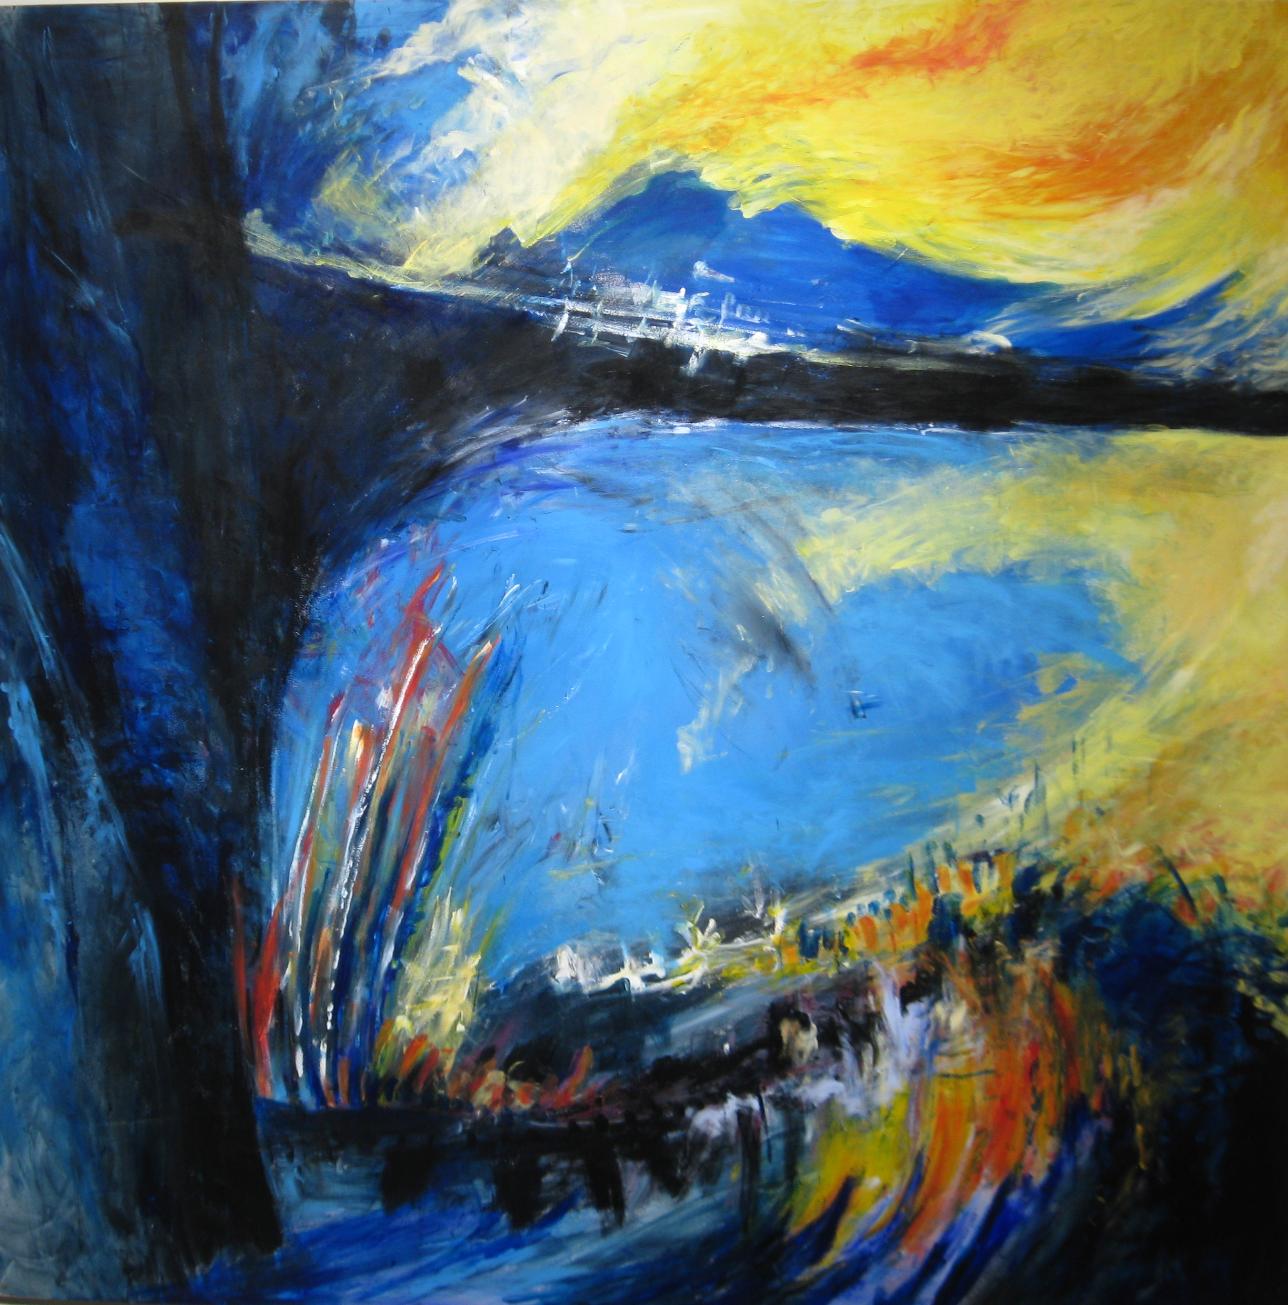 Carle amyot, Le coeur du paysage